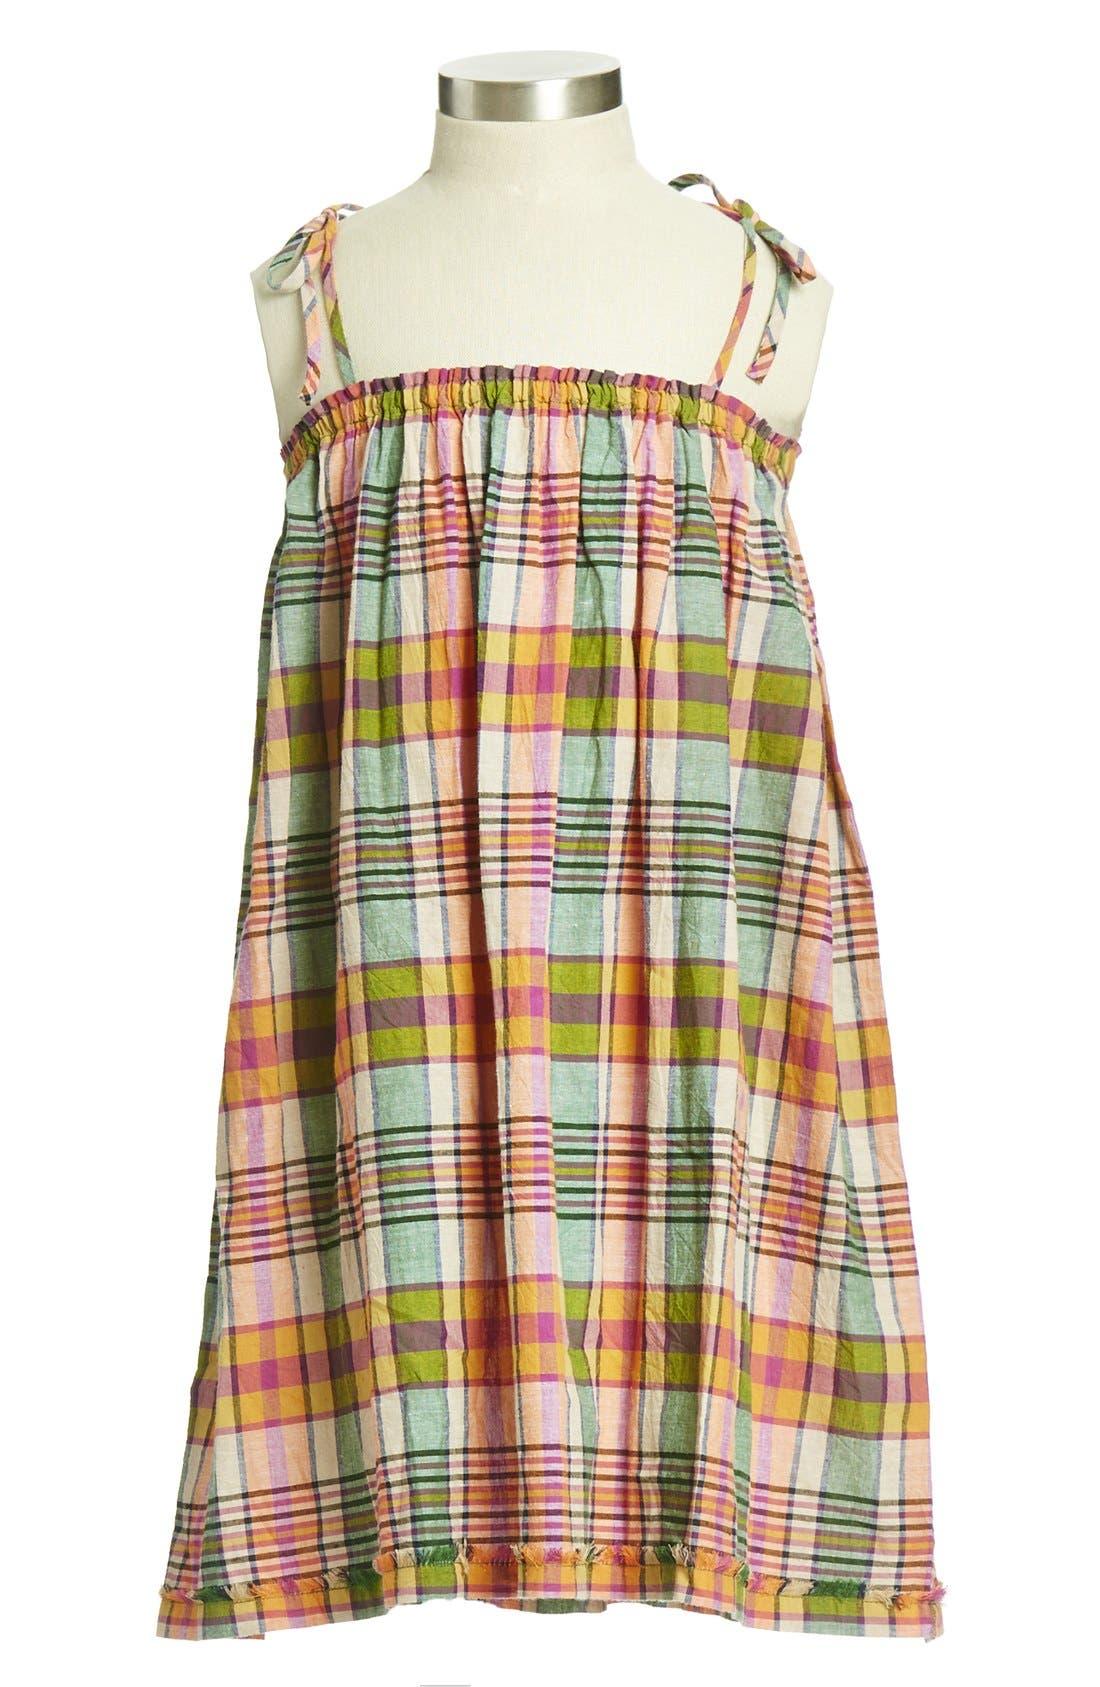 Alternate Image 1 Selected - Peek 'Collette' Plaid Cotton Dress (Toddler Girls, Little Girls & Big Girls)